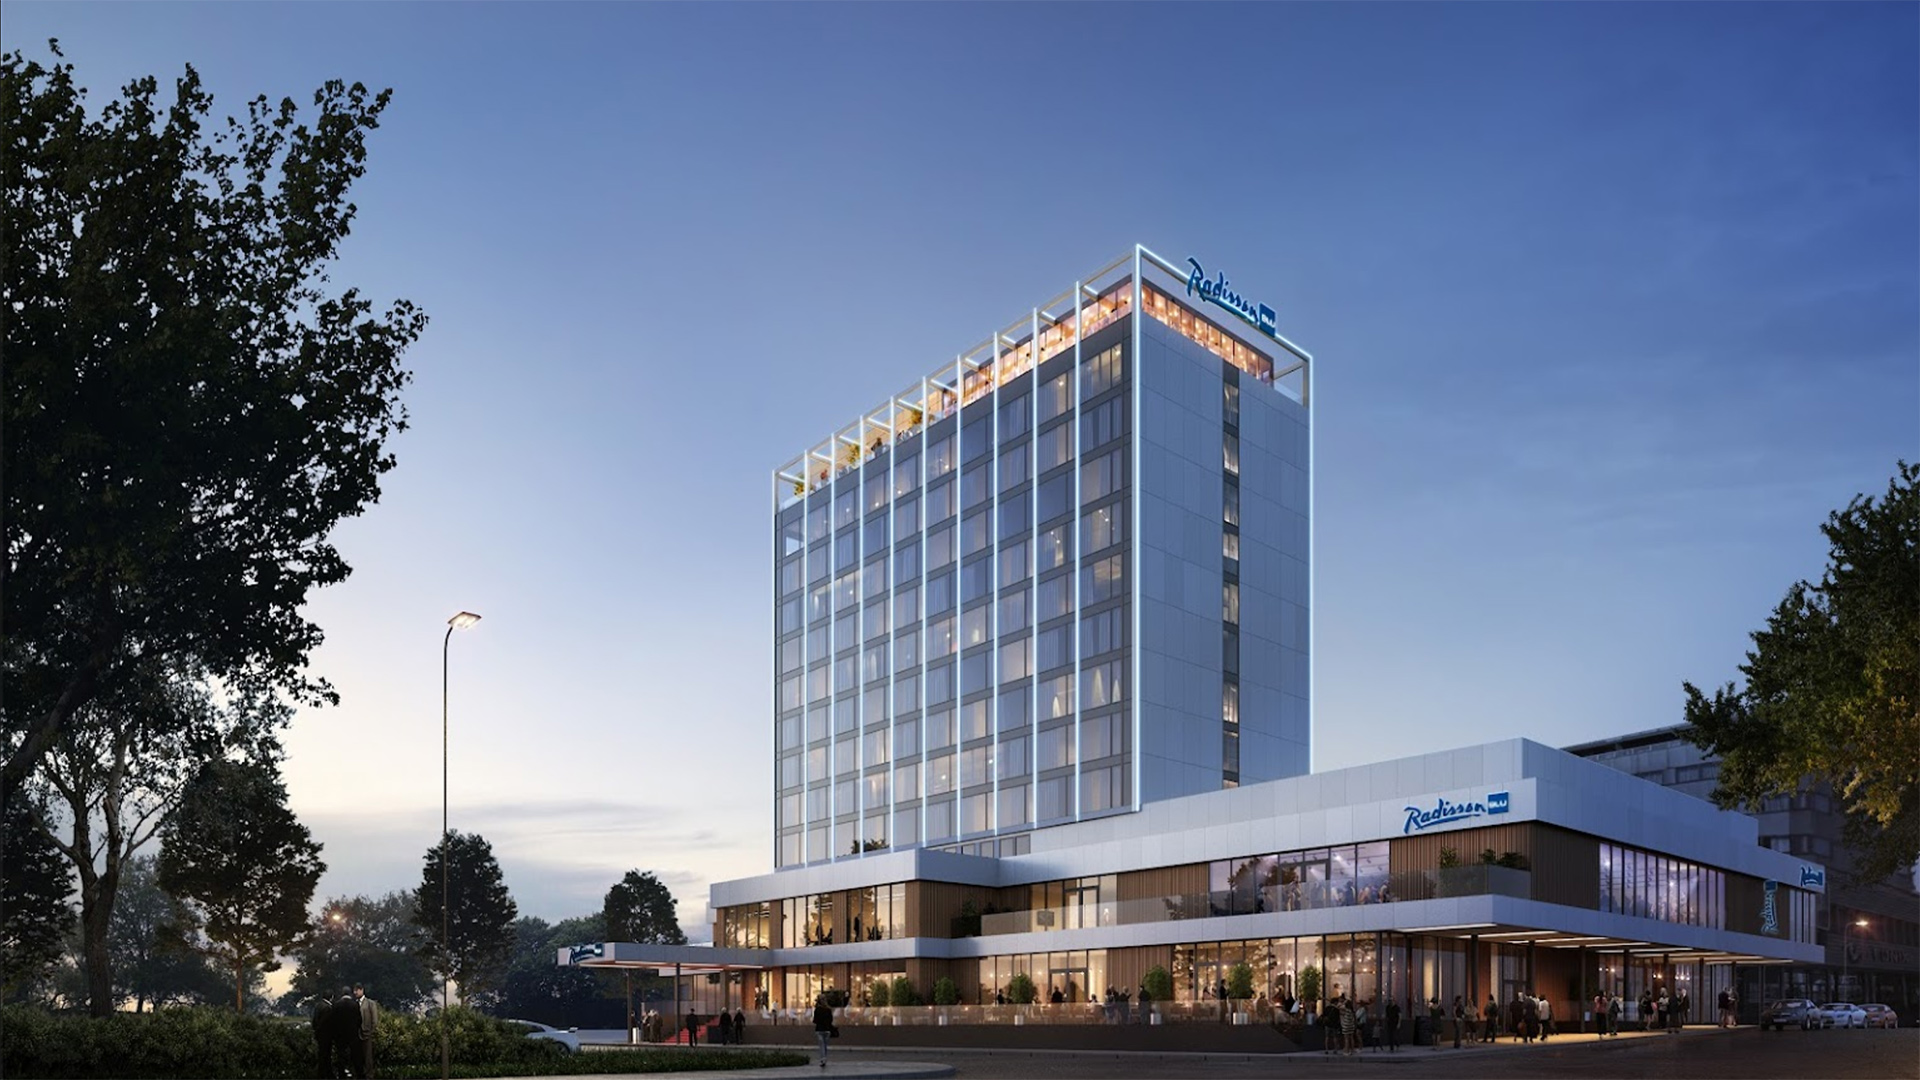 Radisson Blu Caledonien Hotel